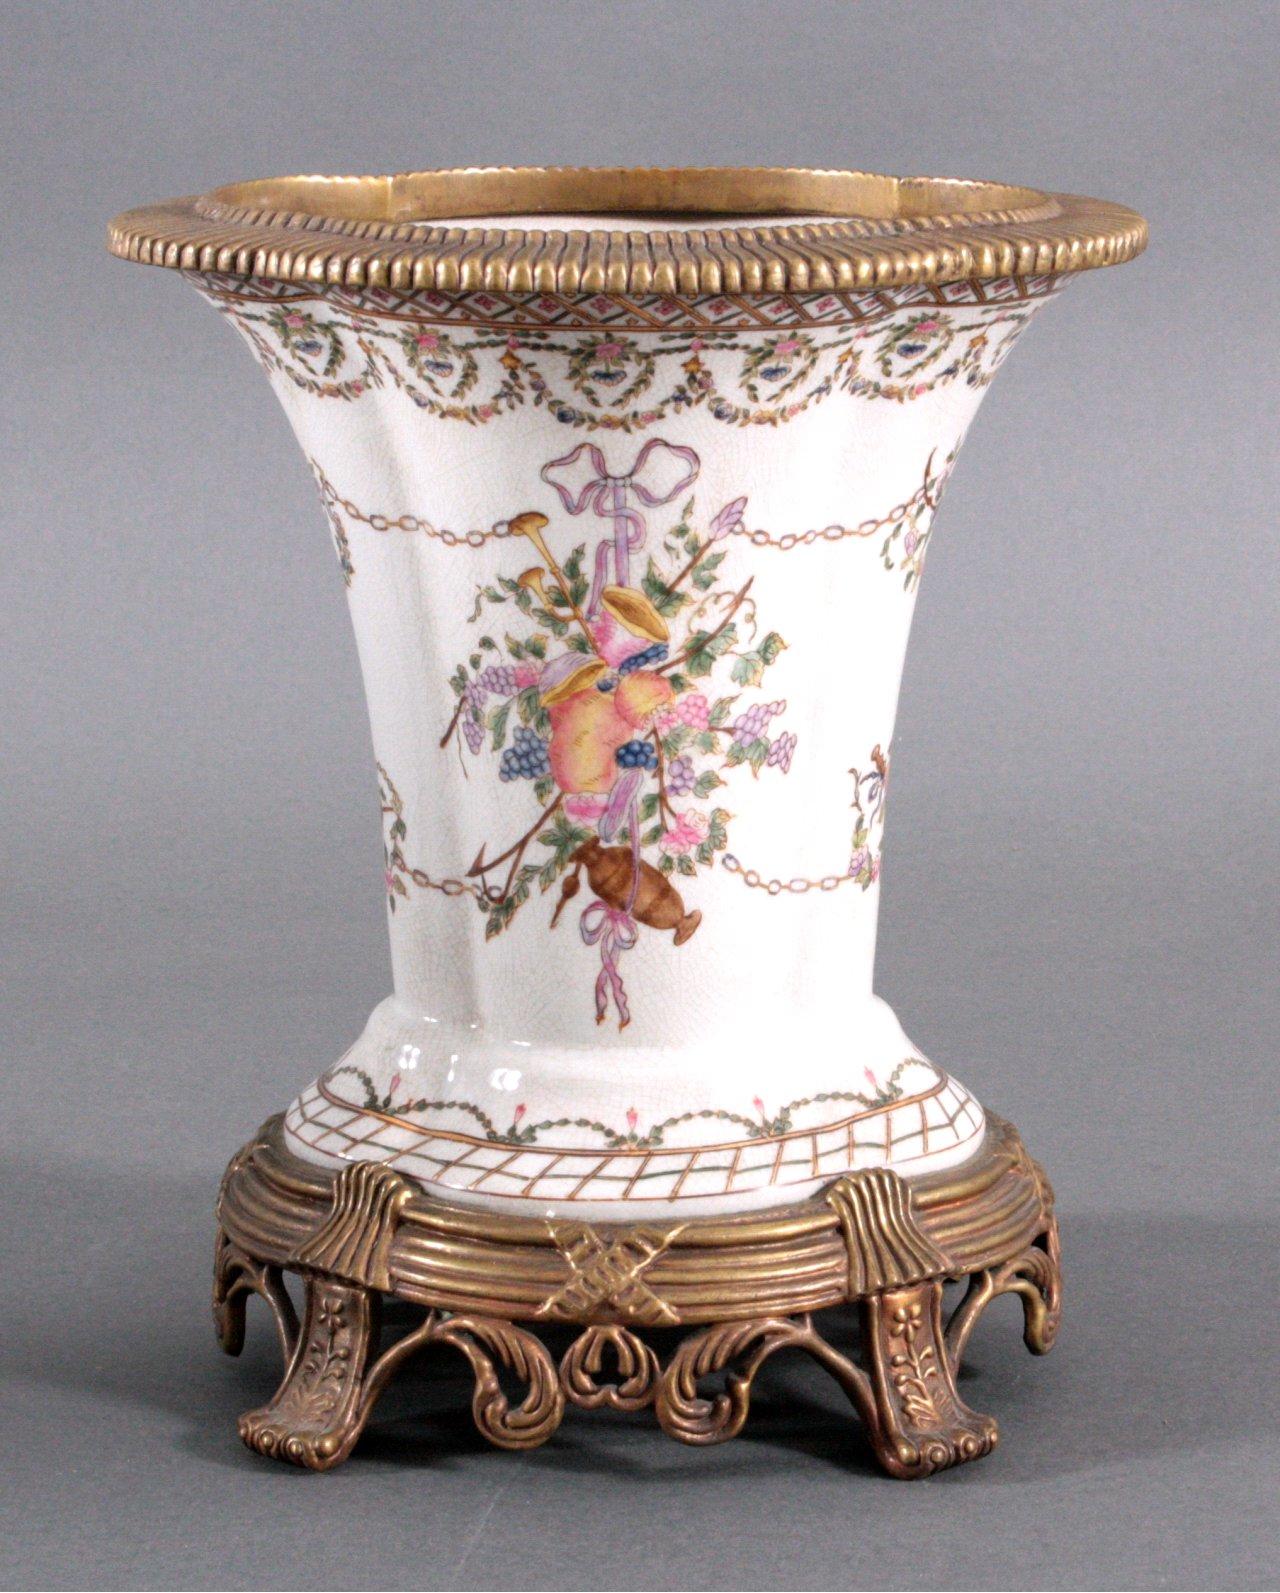 William Lowe, große Vase